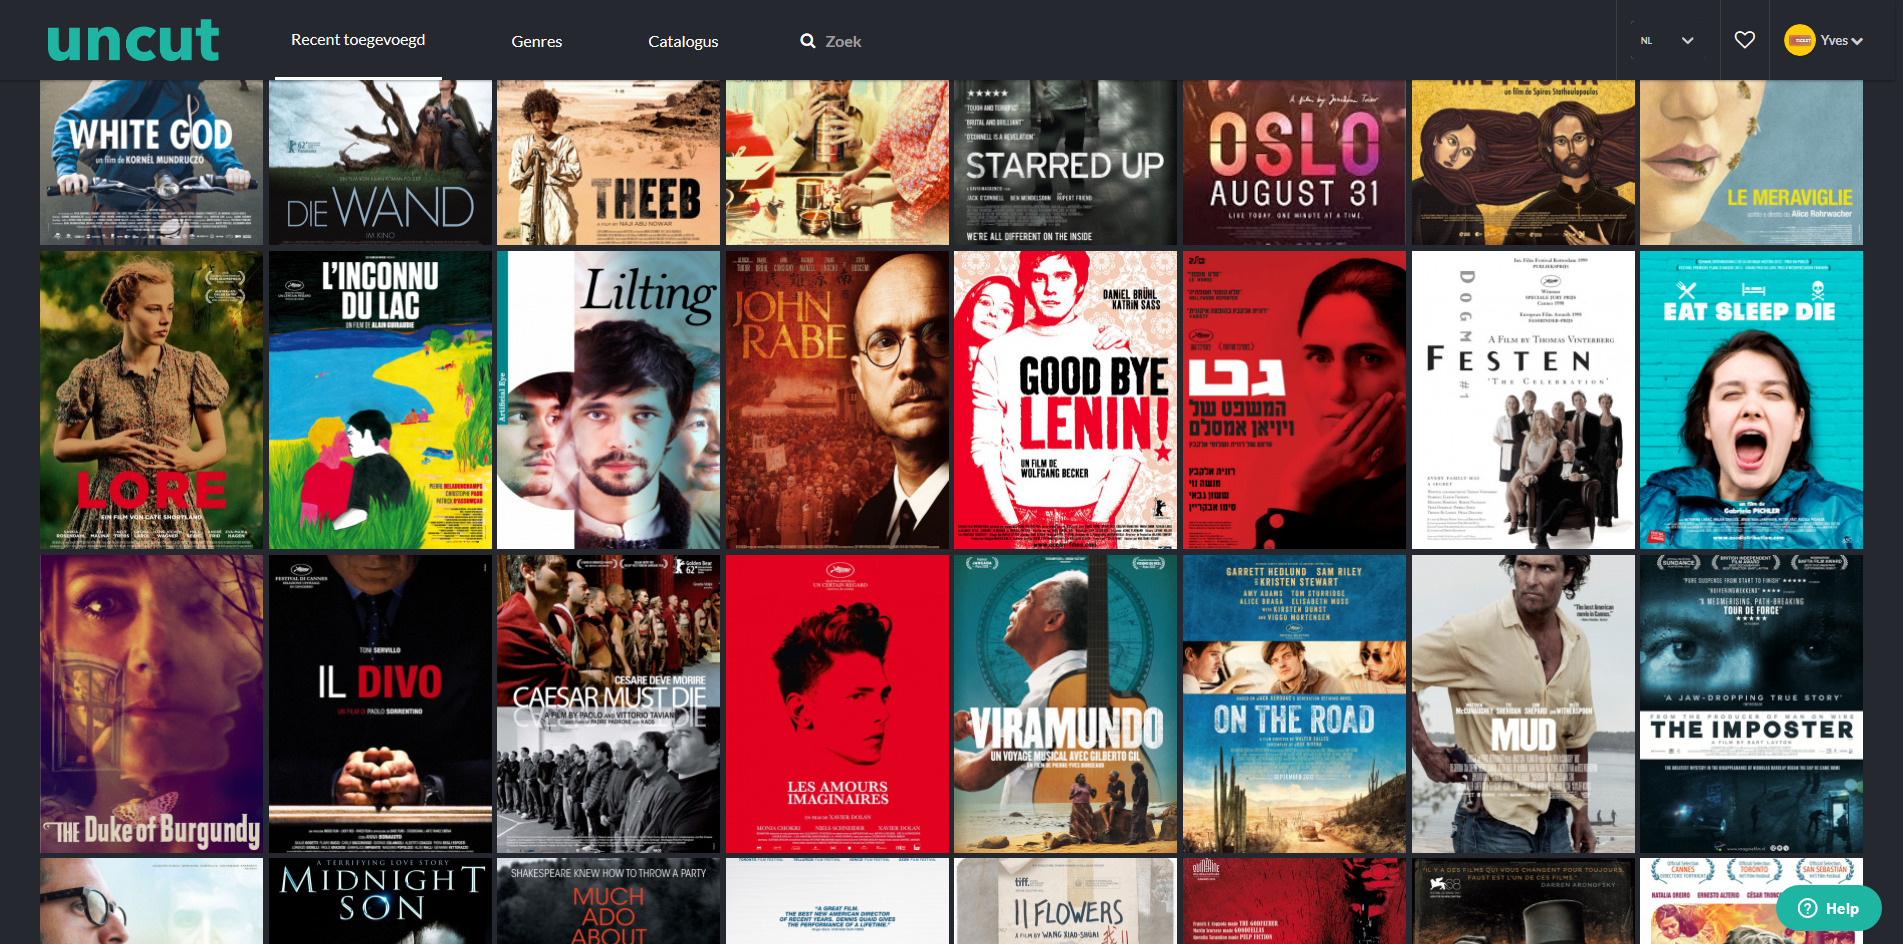 uncut netflix films on demand